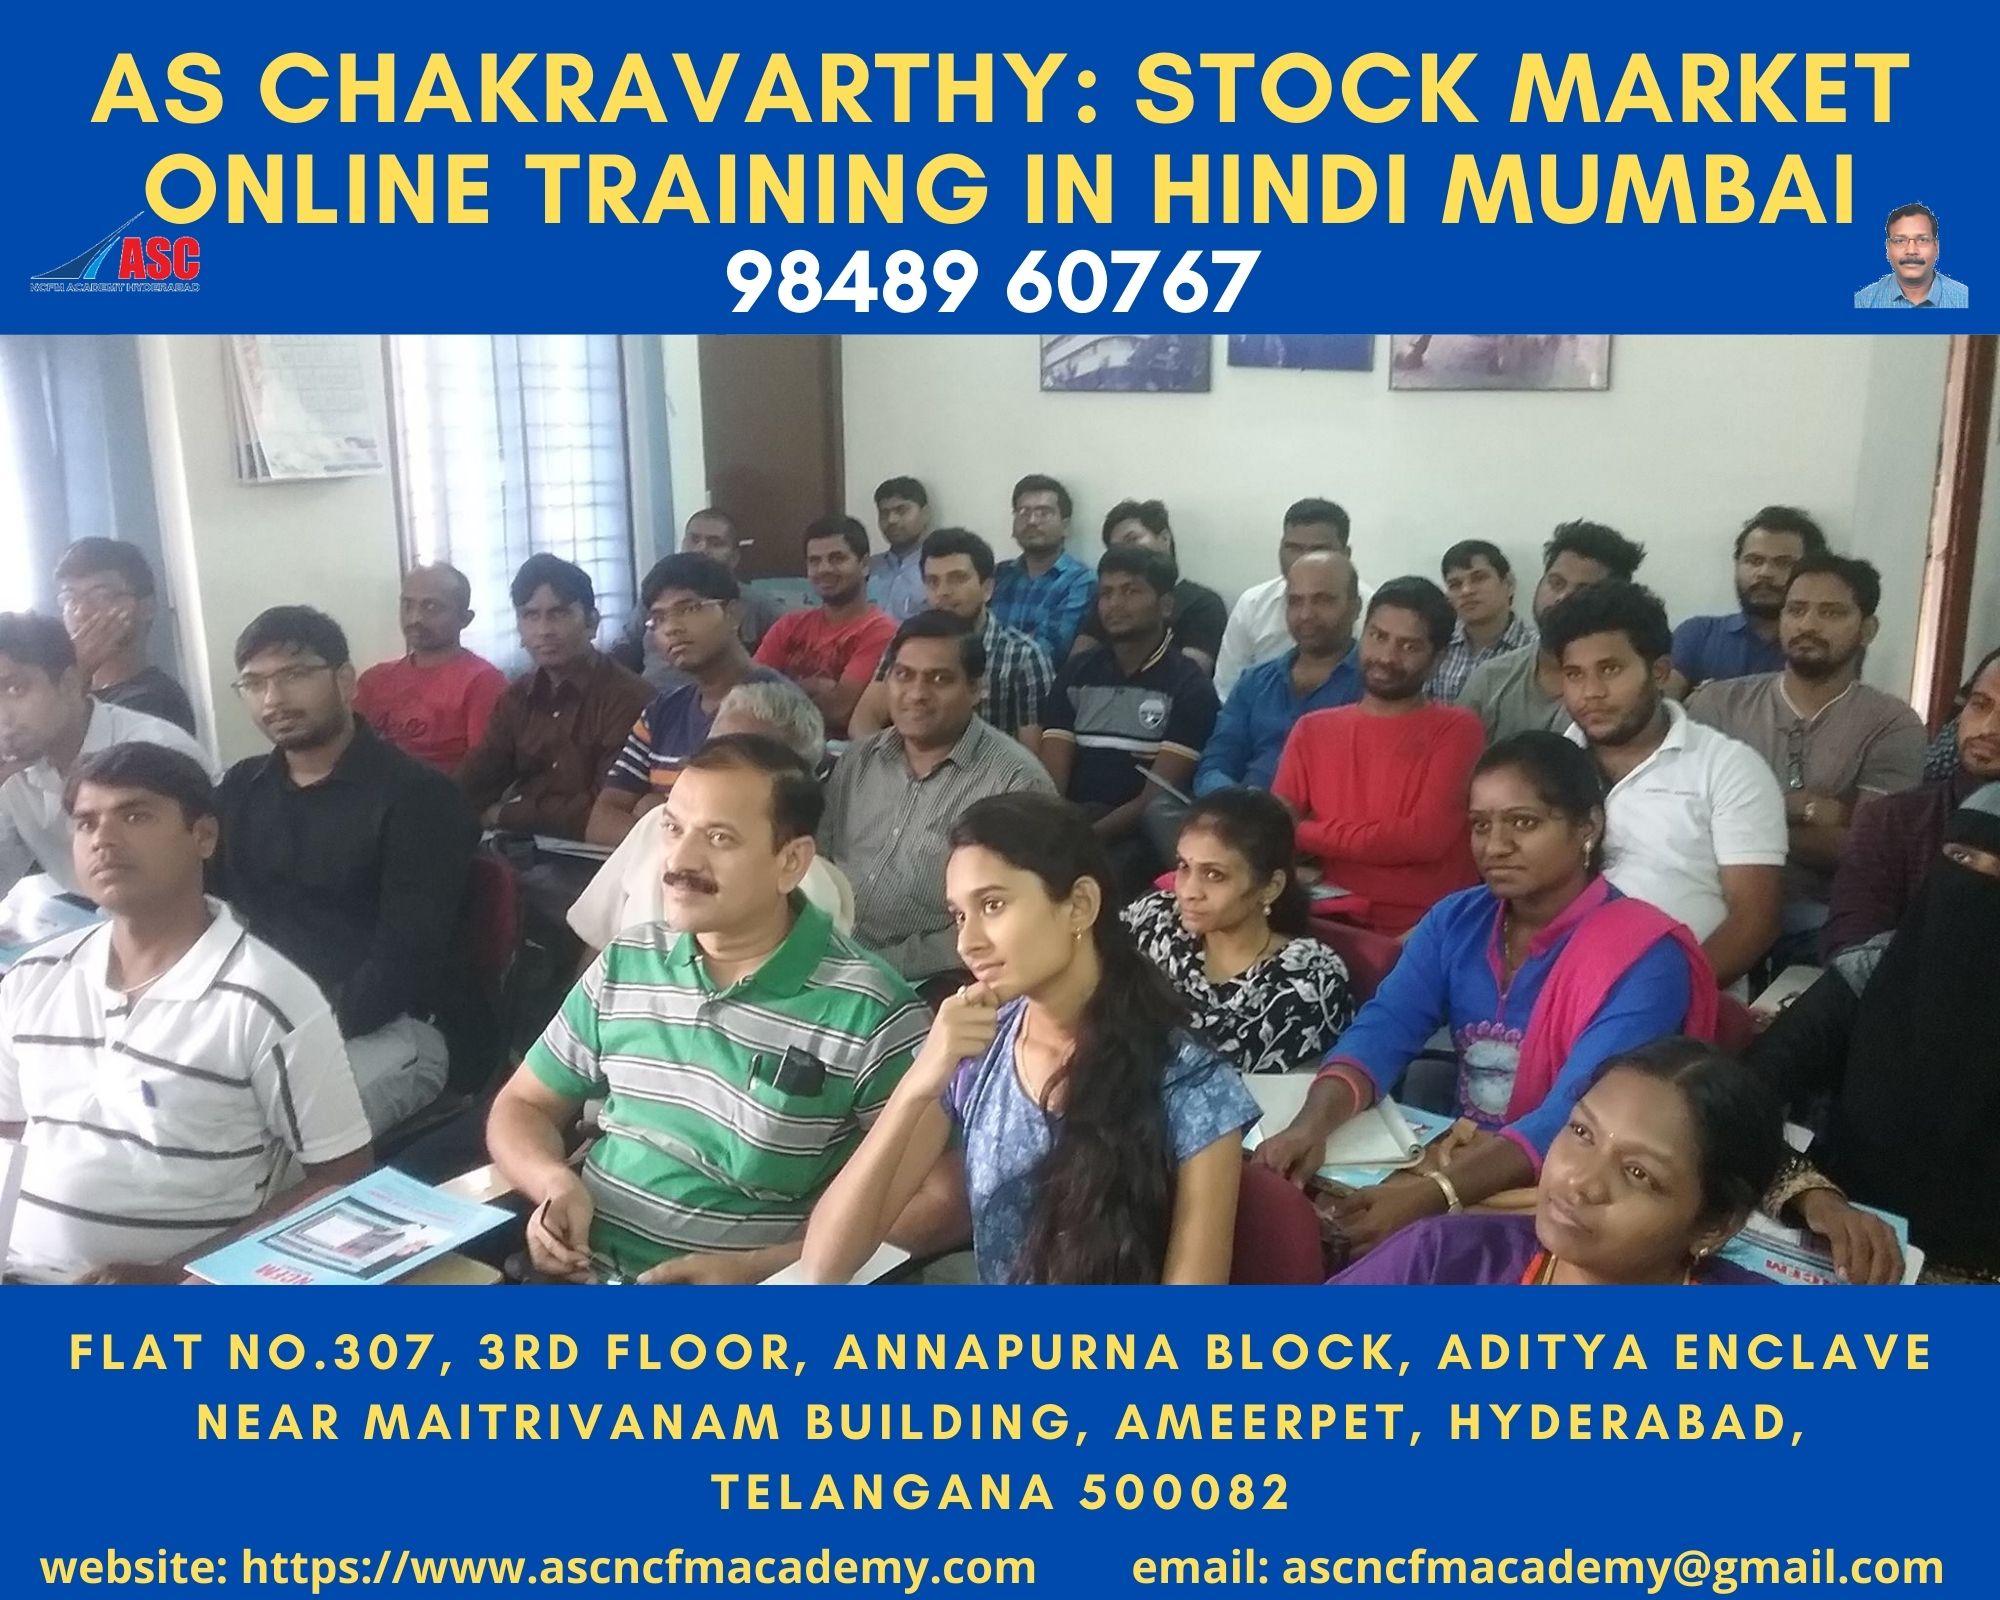 Oline Stock Market Technical Training in Hindi Mumbai